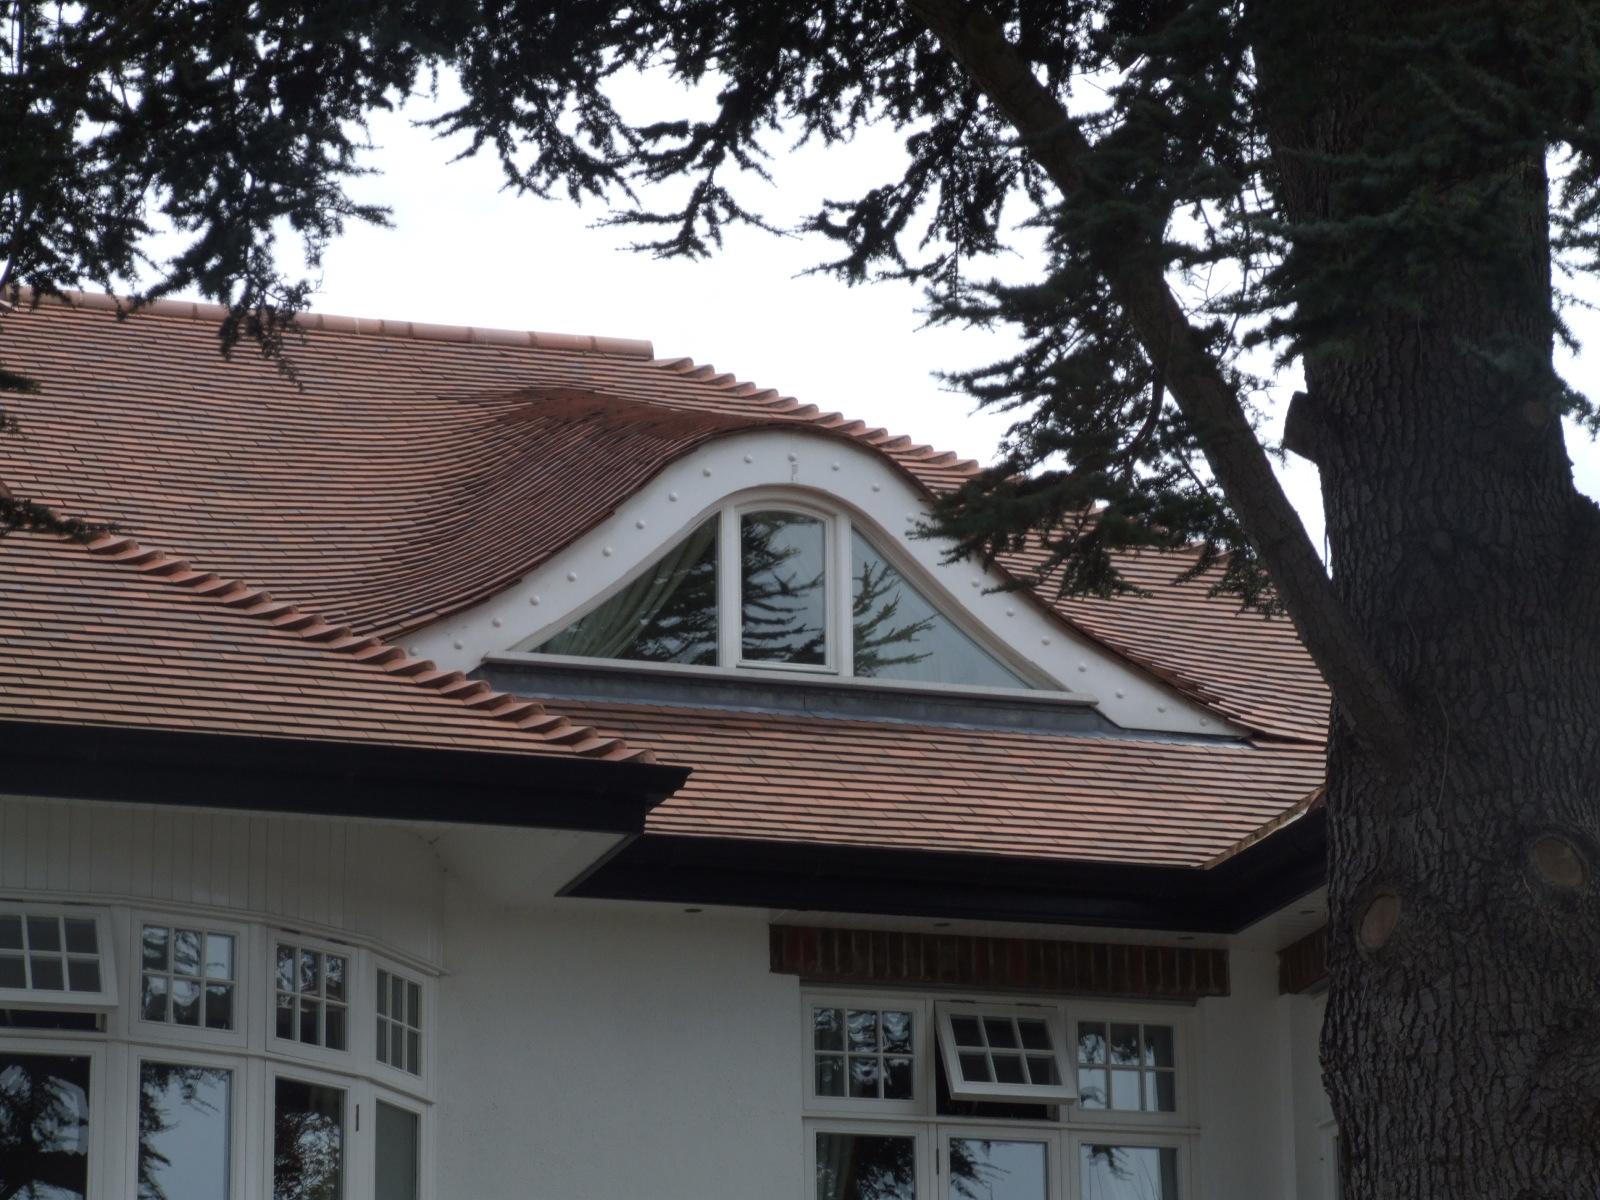 Eyebrow dormer design - Dormer skylight best choice ...